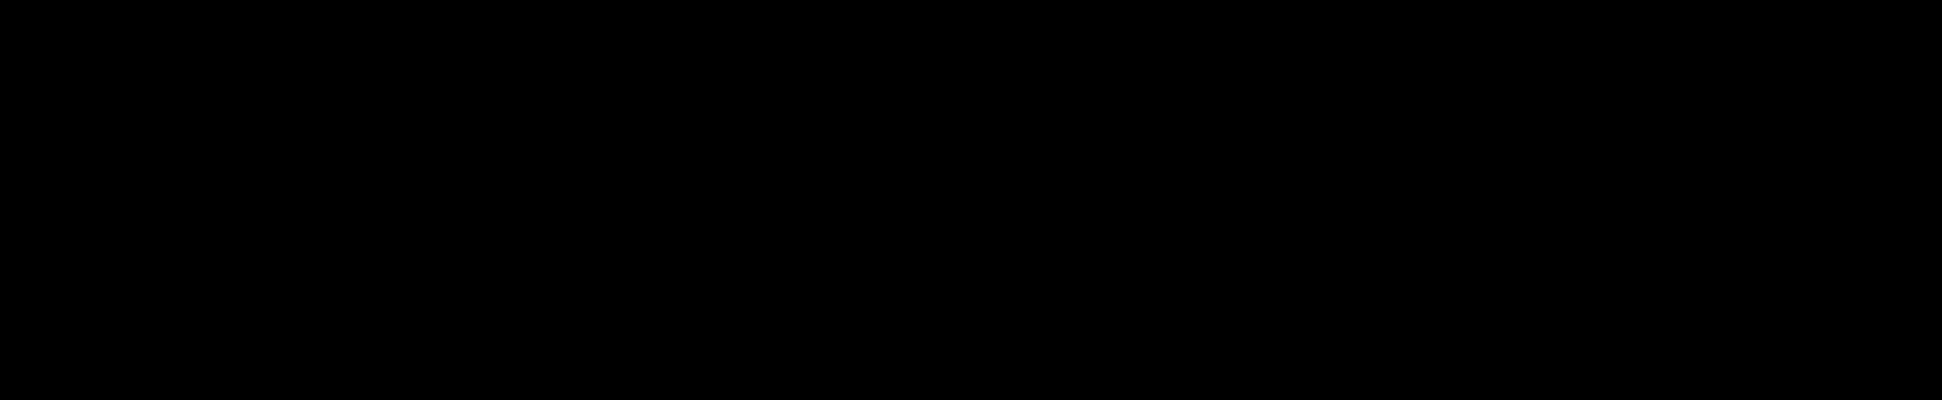 DPPE hydrochloride